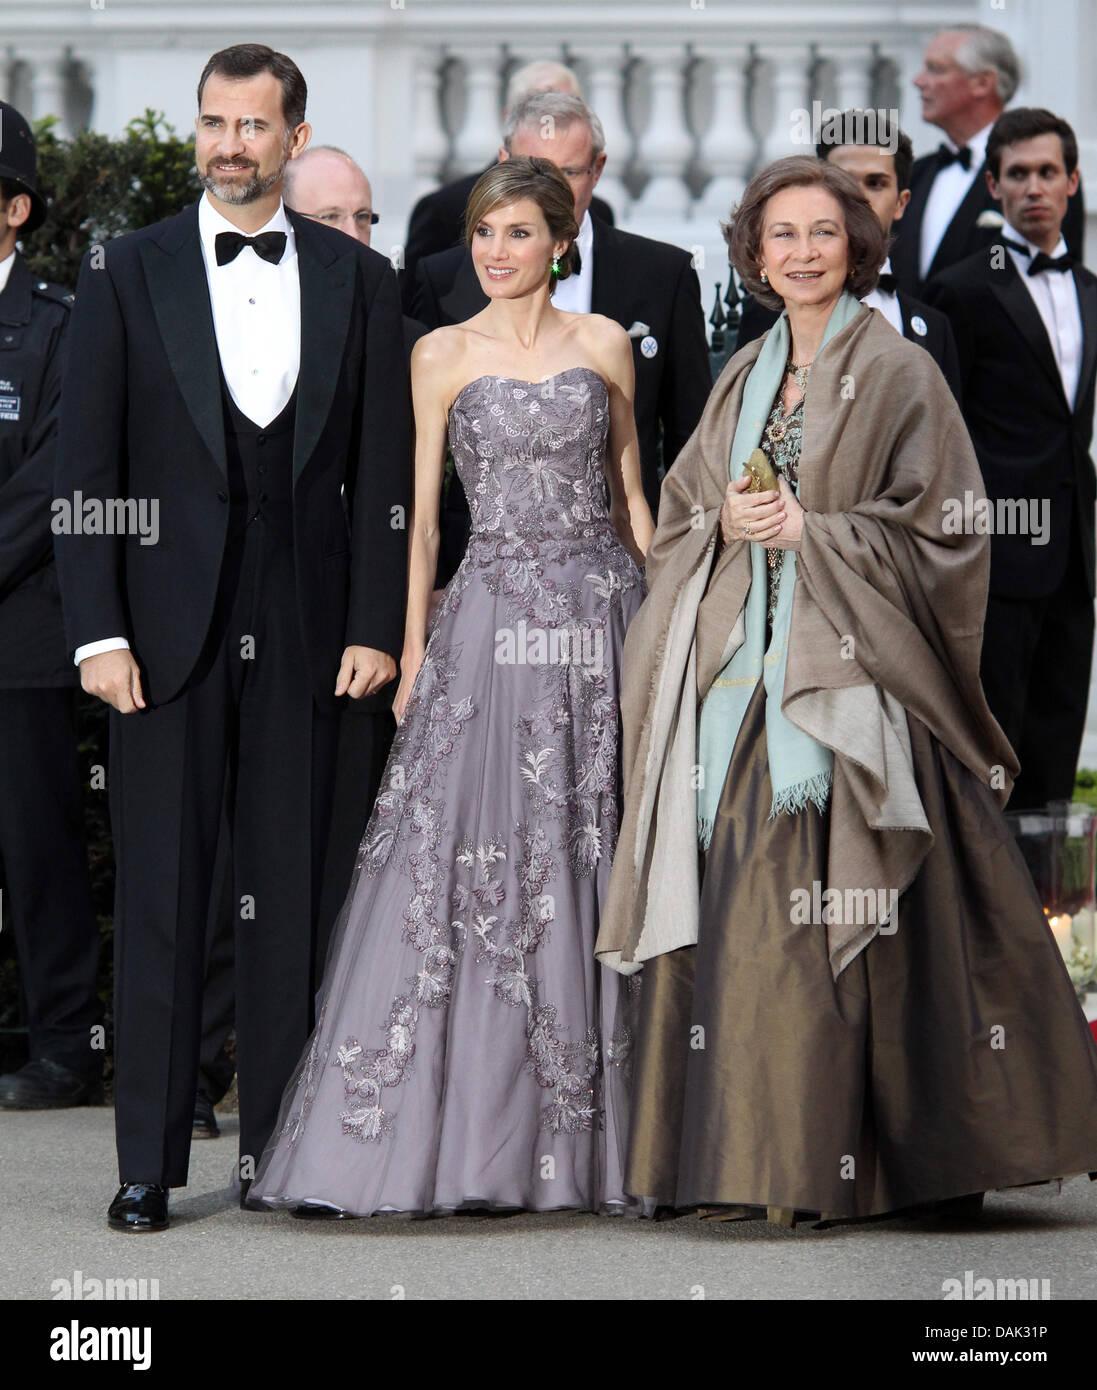 Princess Letizia Wedding Dress Royal Stock Photos & Princess Letizia ...